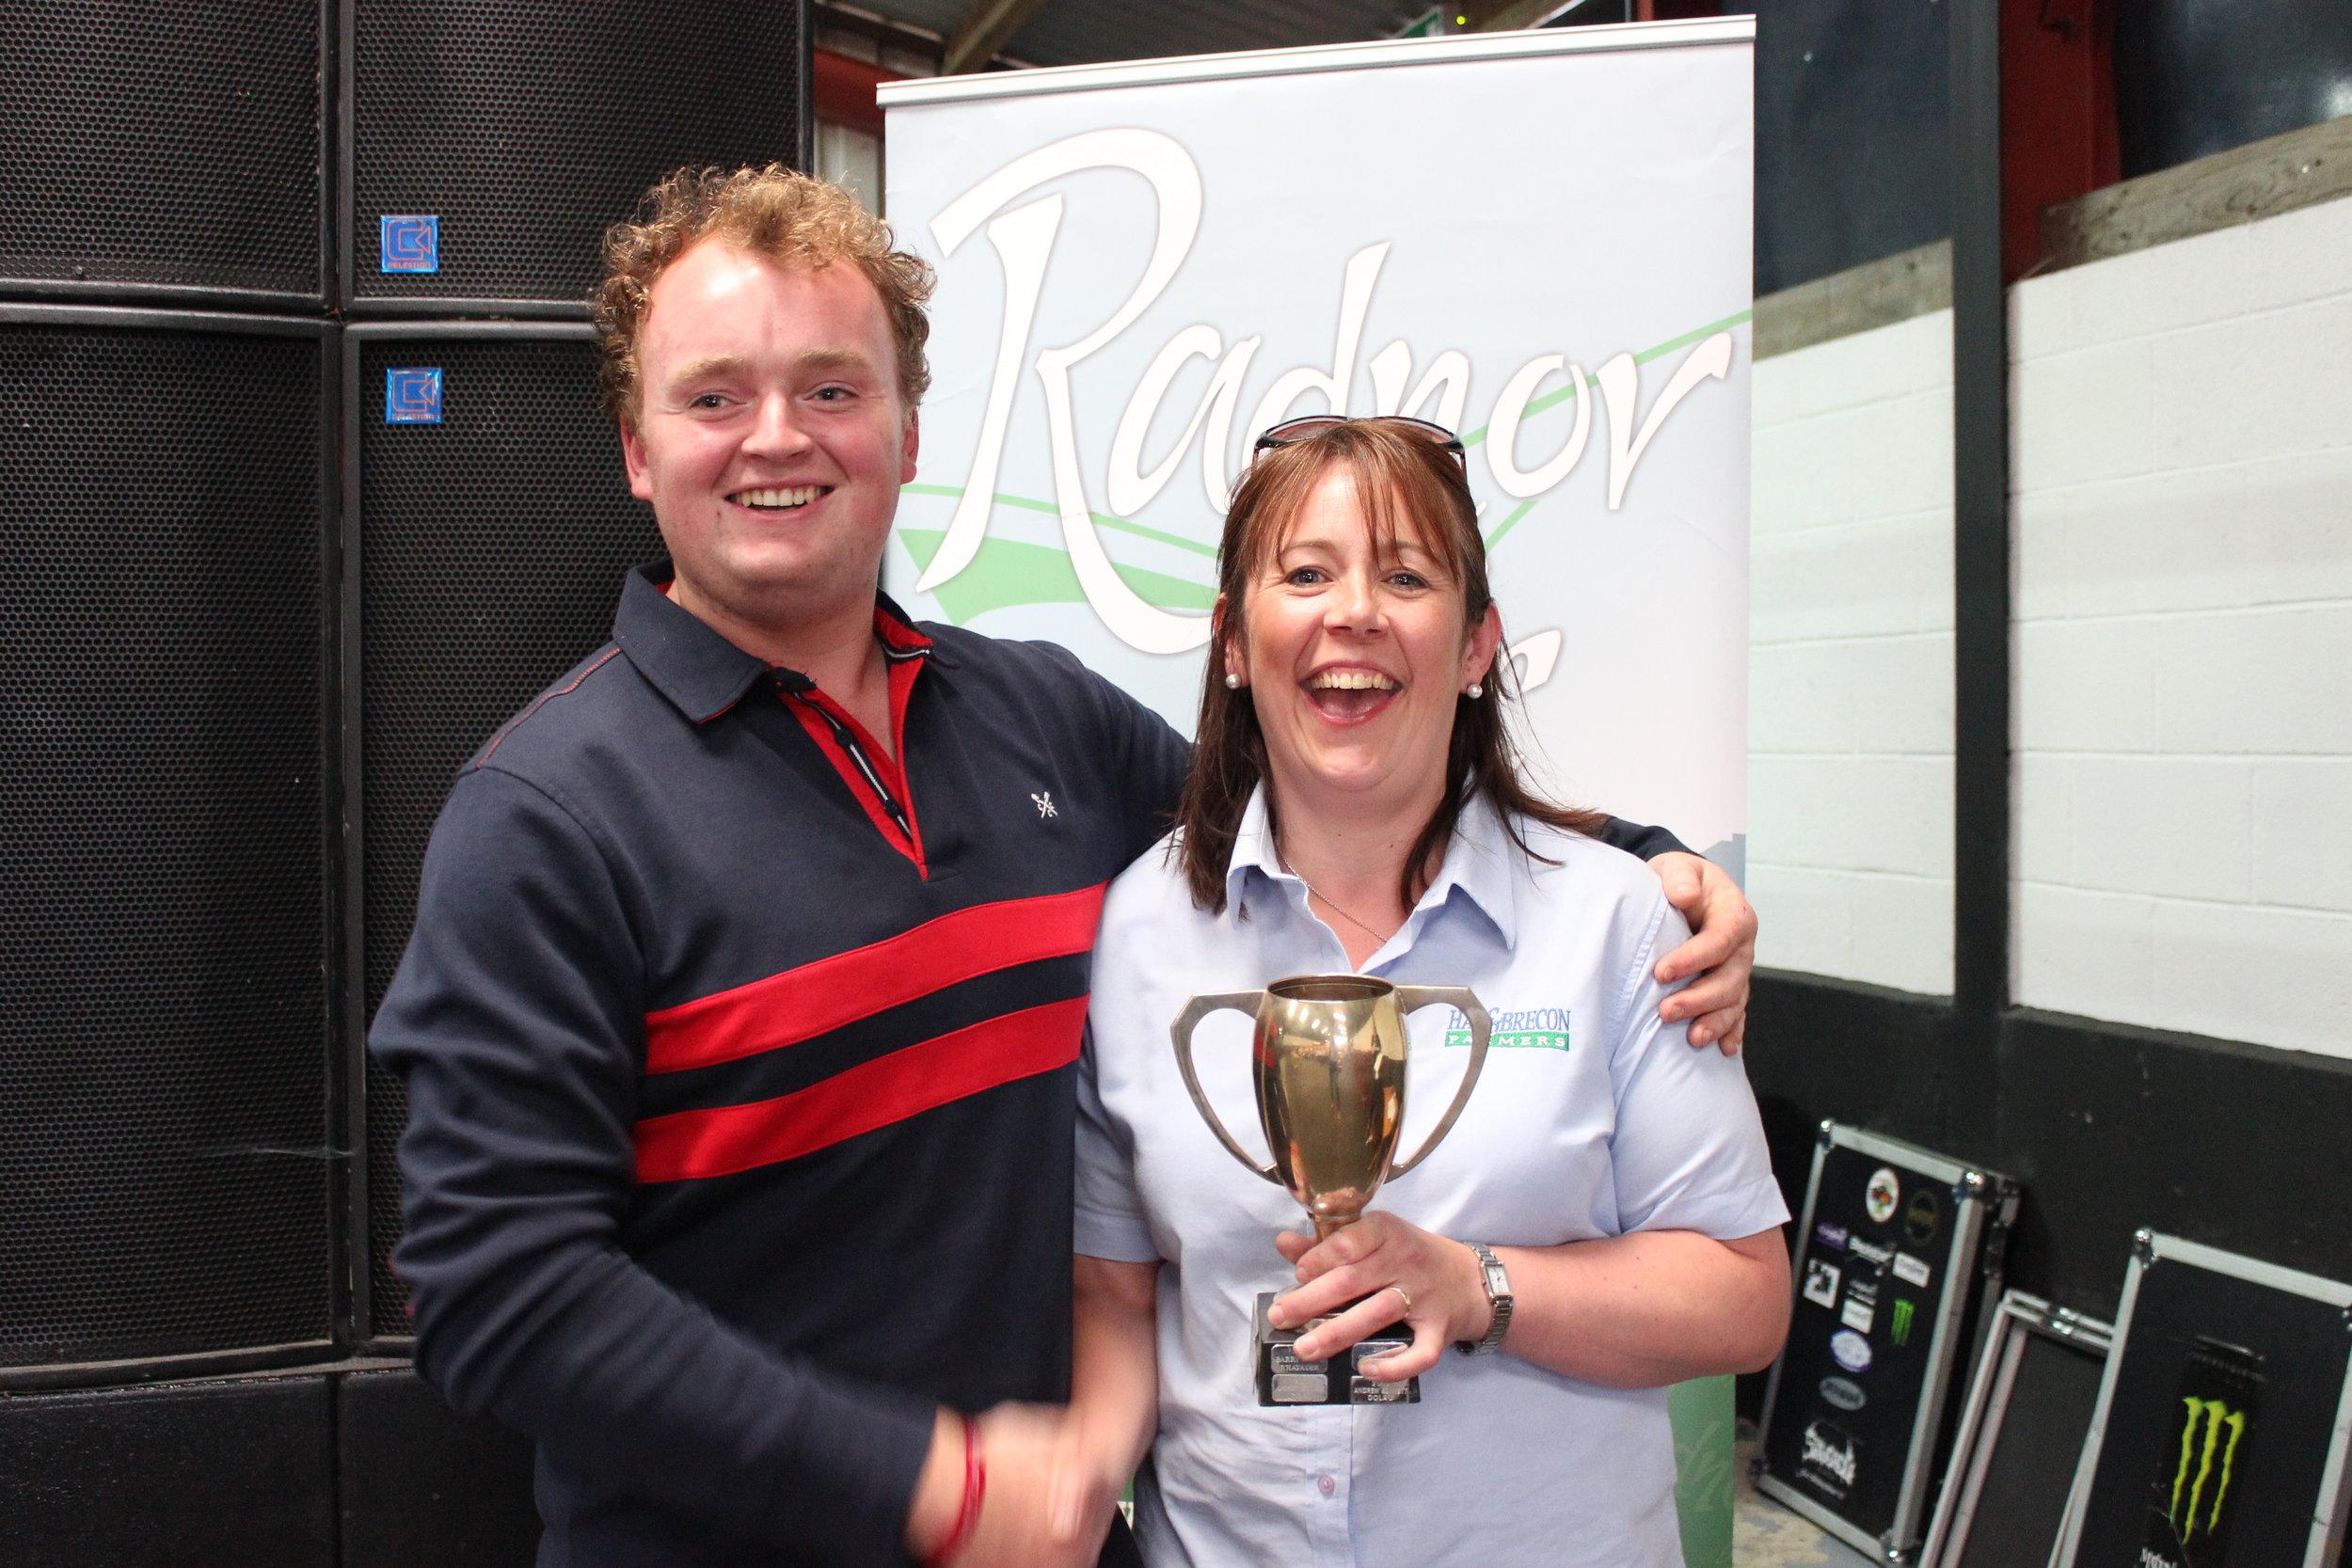 Sam Powell, Penybont YFC - Ian Jones Perpetual Cup / 'Best Pen' in the Shearing Classes